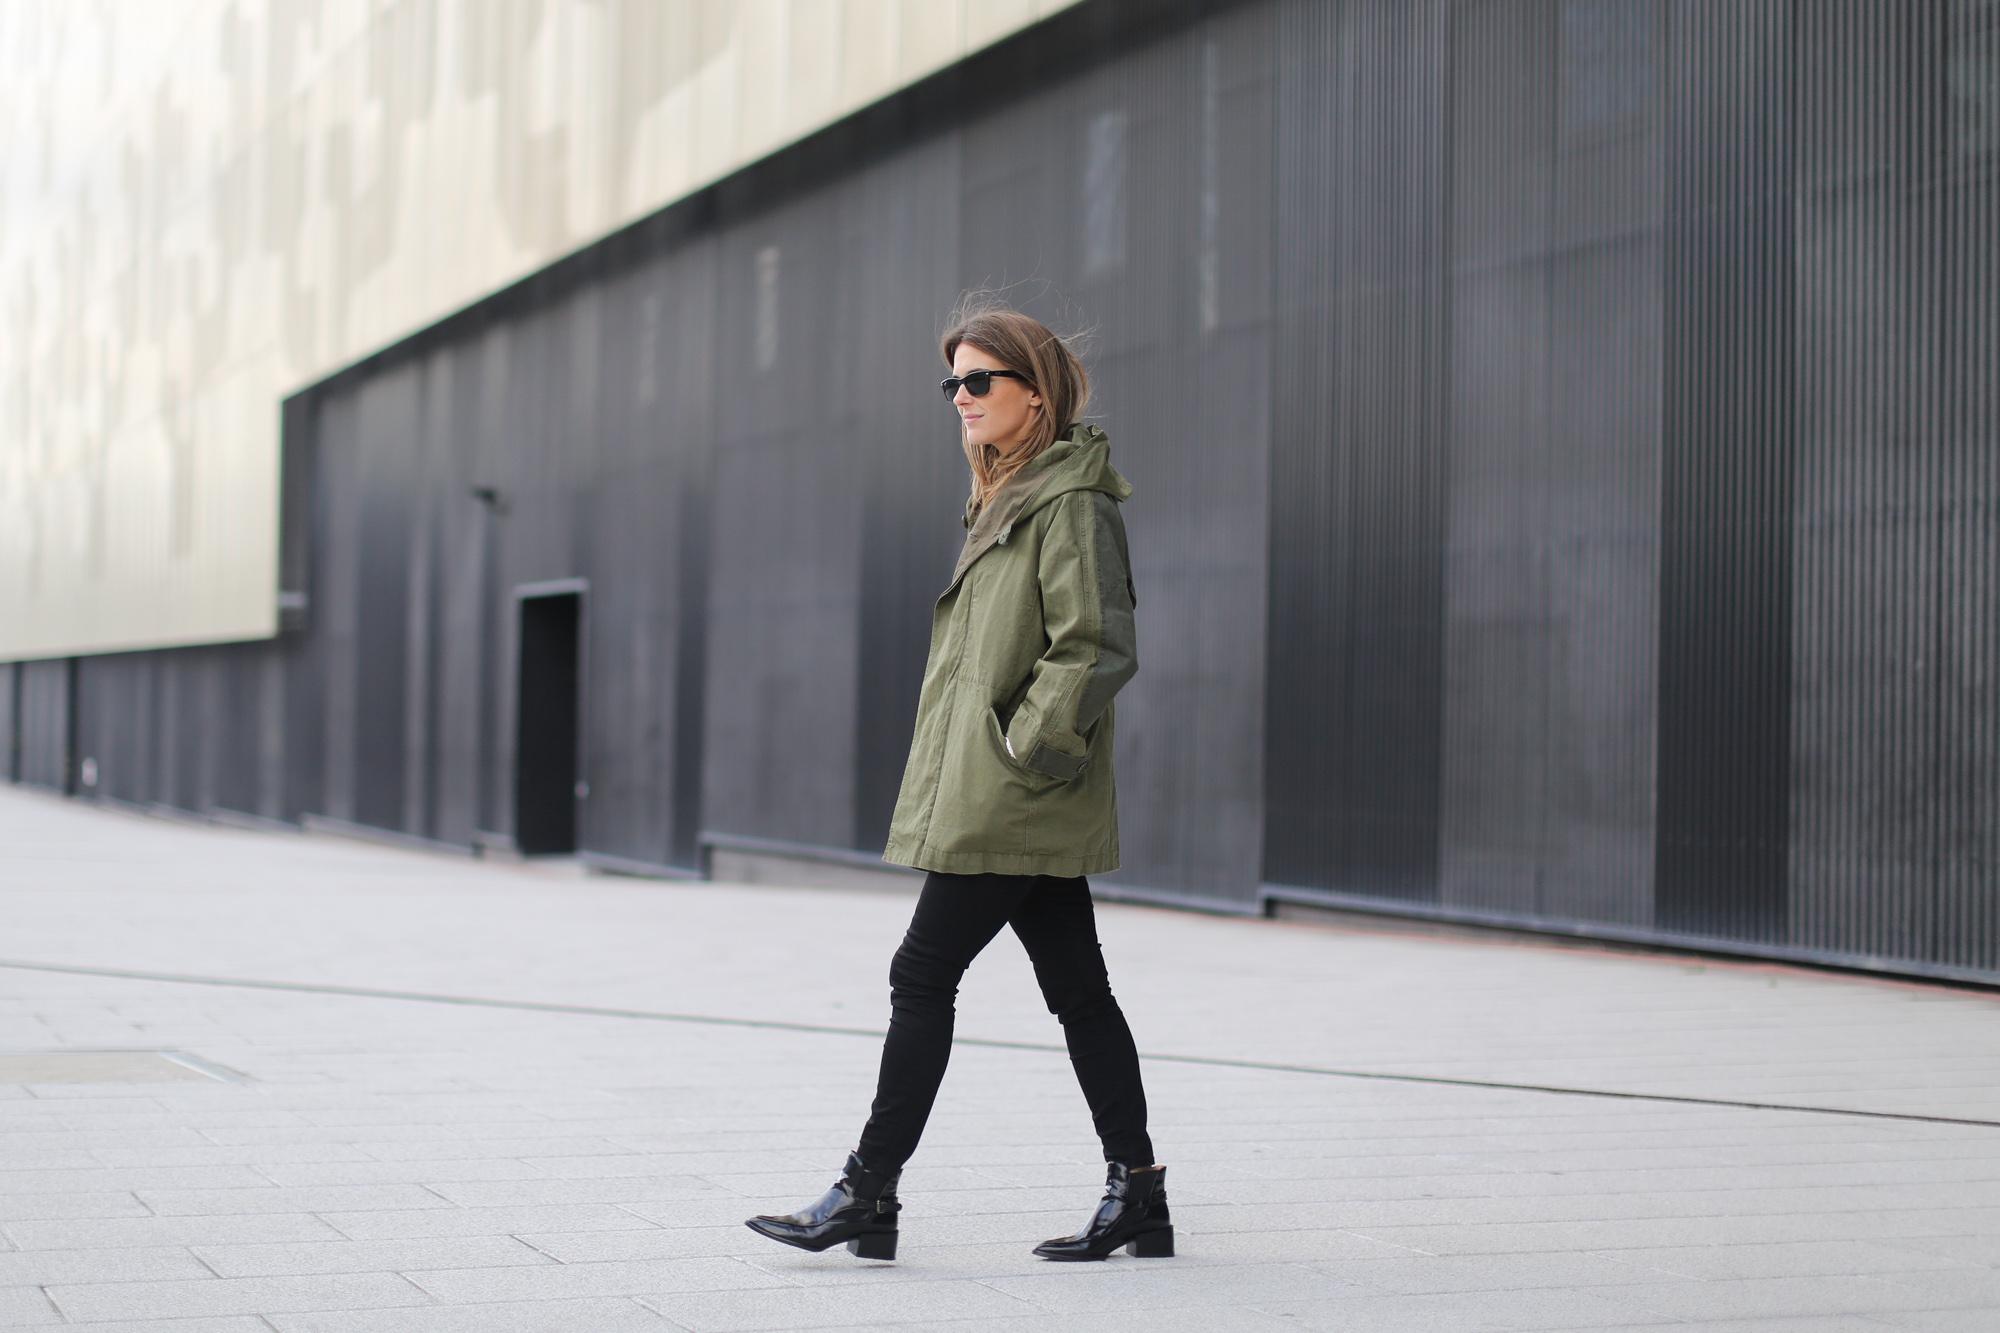 Clochet-streetstyle-isabel-marant-ellison-parka-h&m-trend-shirt-4